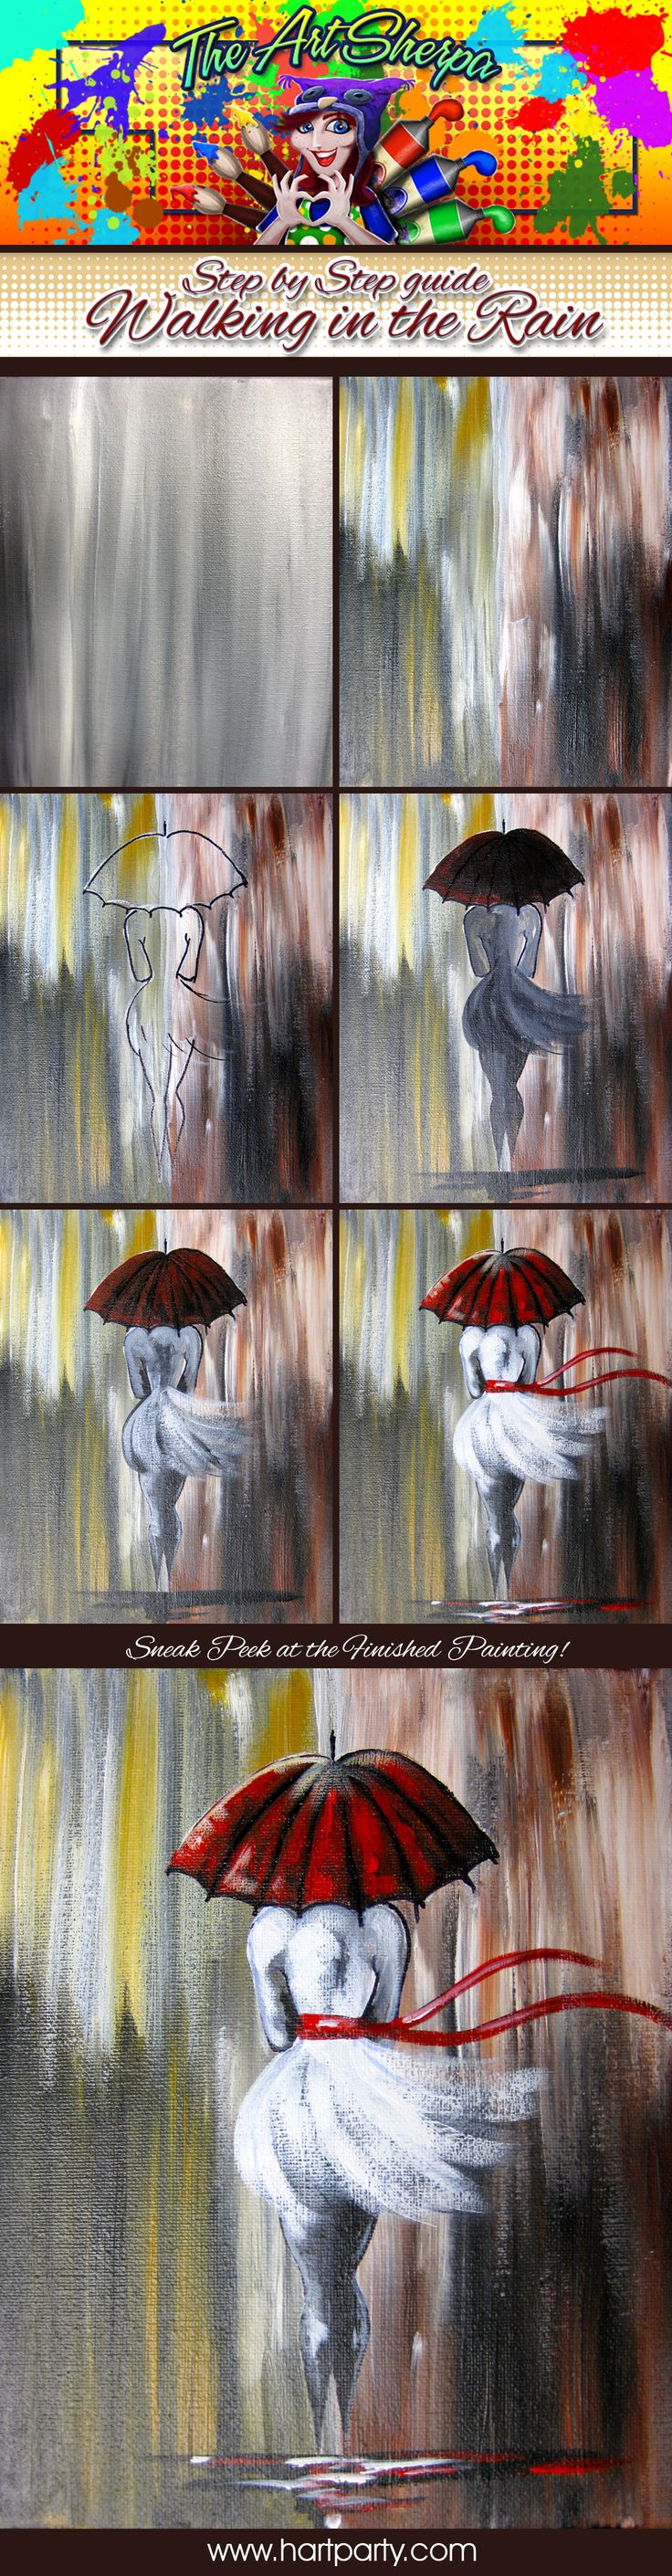 Best 25+ Black canvas paintings ideas on Pinterest | Black canvas ...